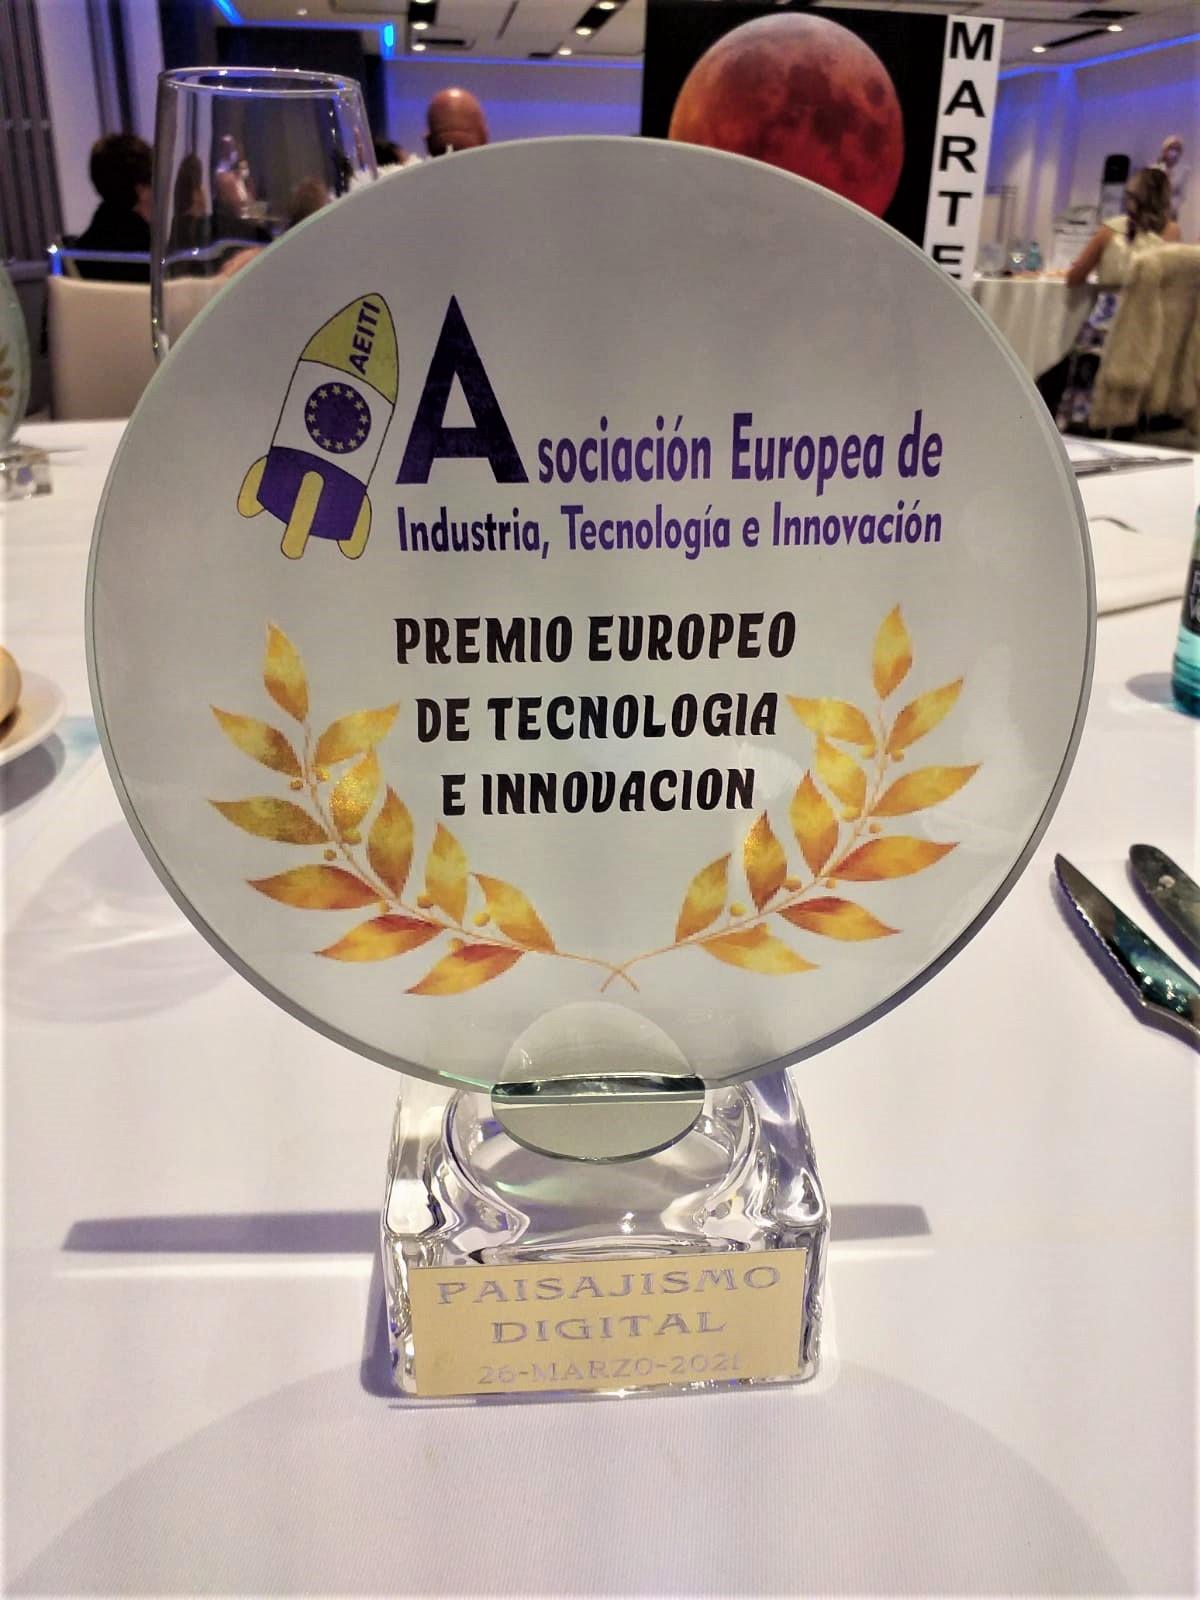 Premio Europeo a la Tecnología e Innovación - Paisajismo Digital